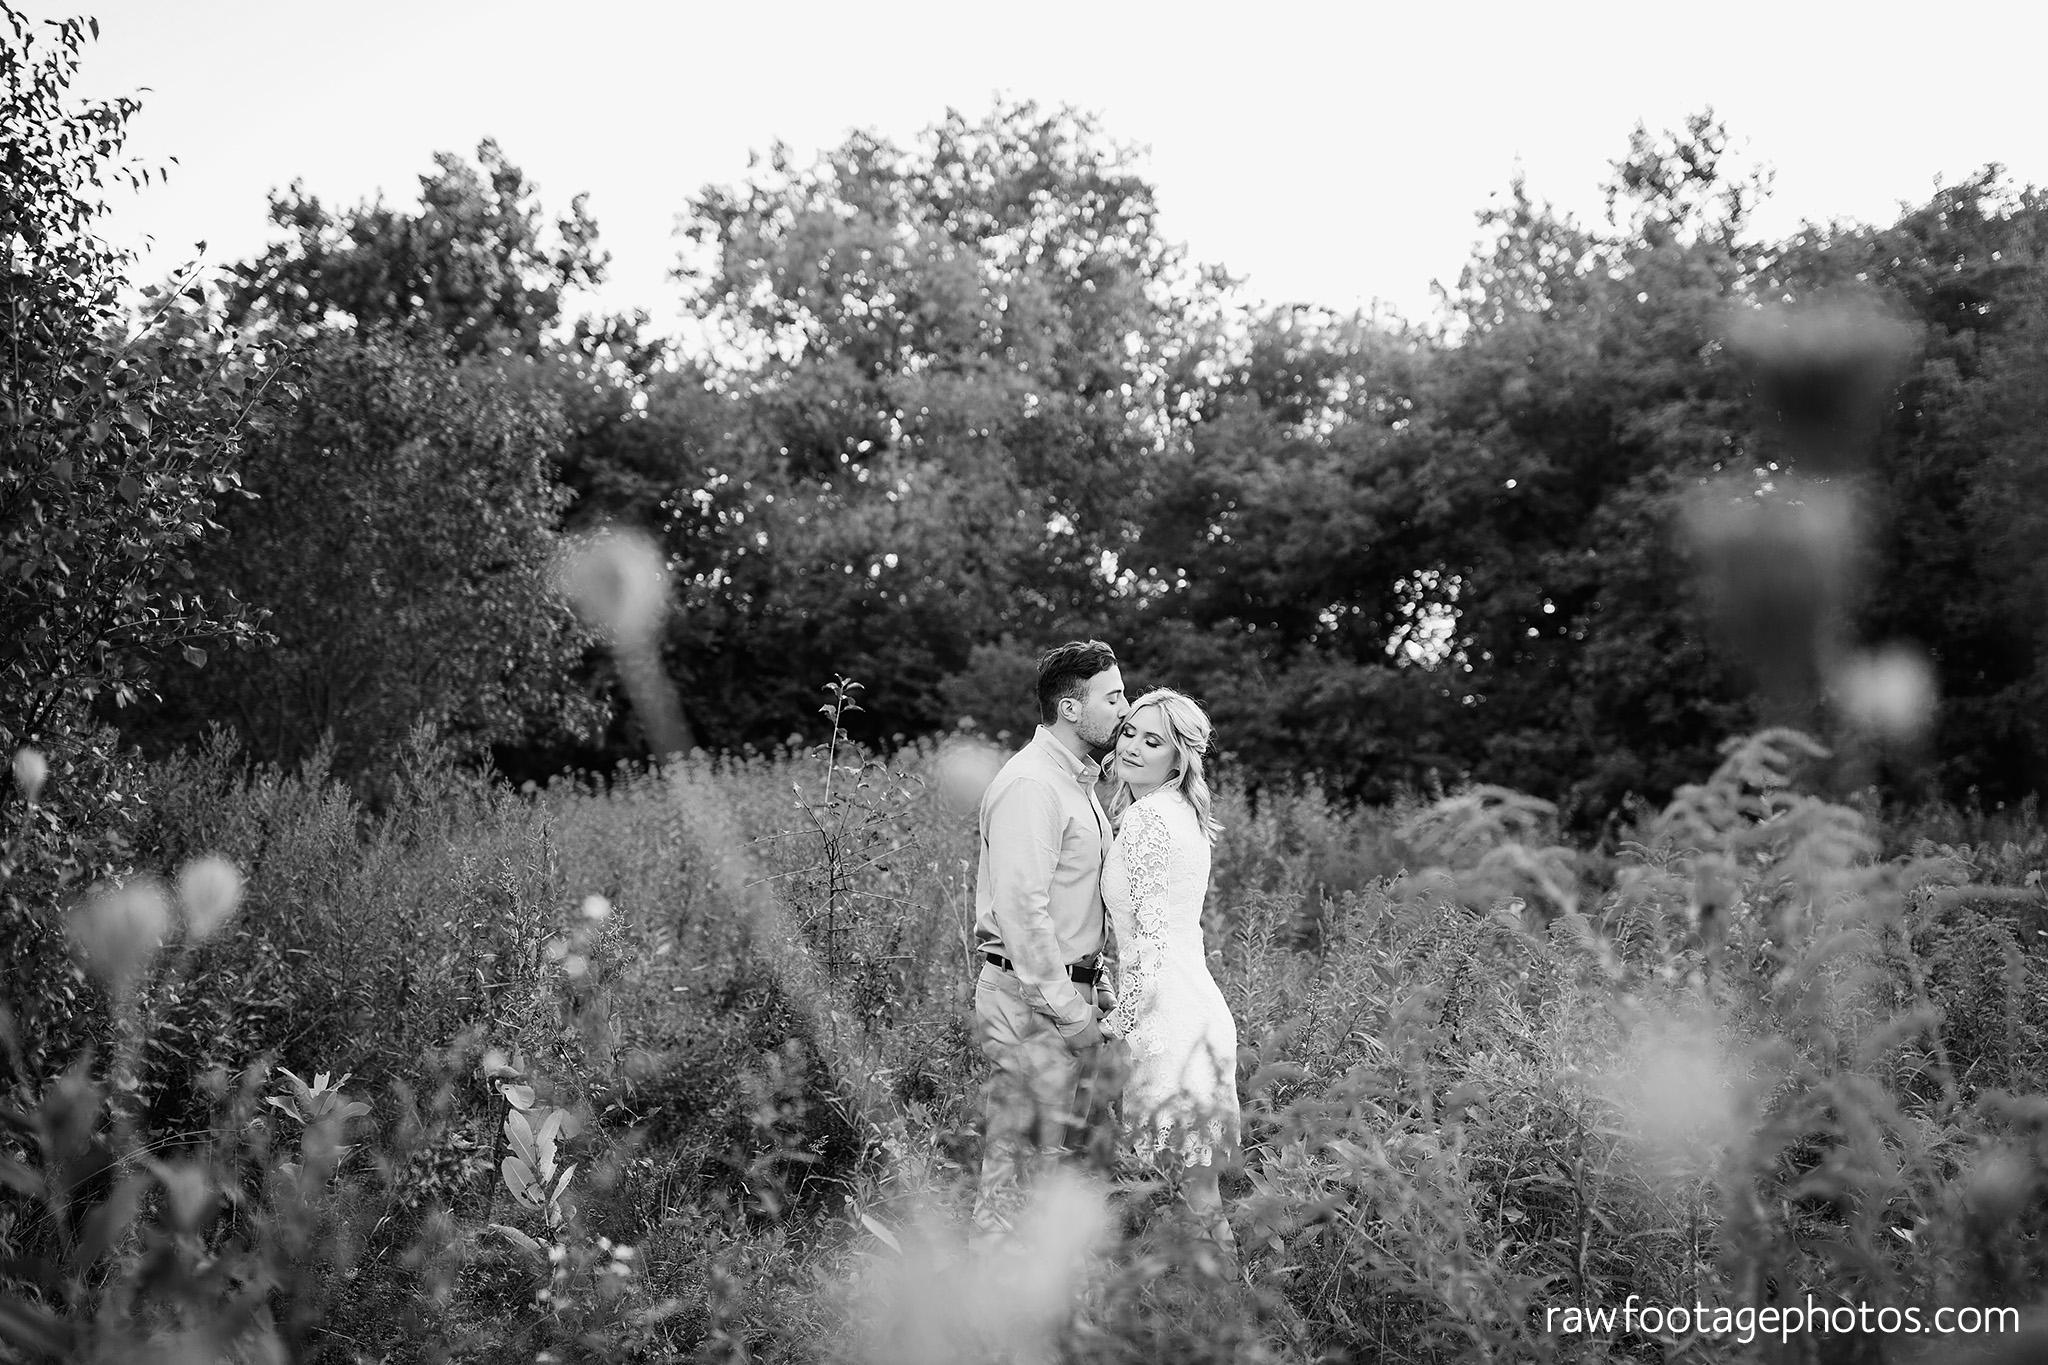 london_ontario_wedding_photographer-raw_footage_photography-engagement_session-uwo-campus-gibbons_park-woods035.jpg